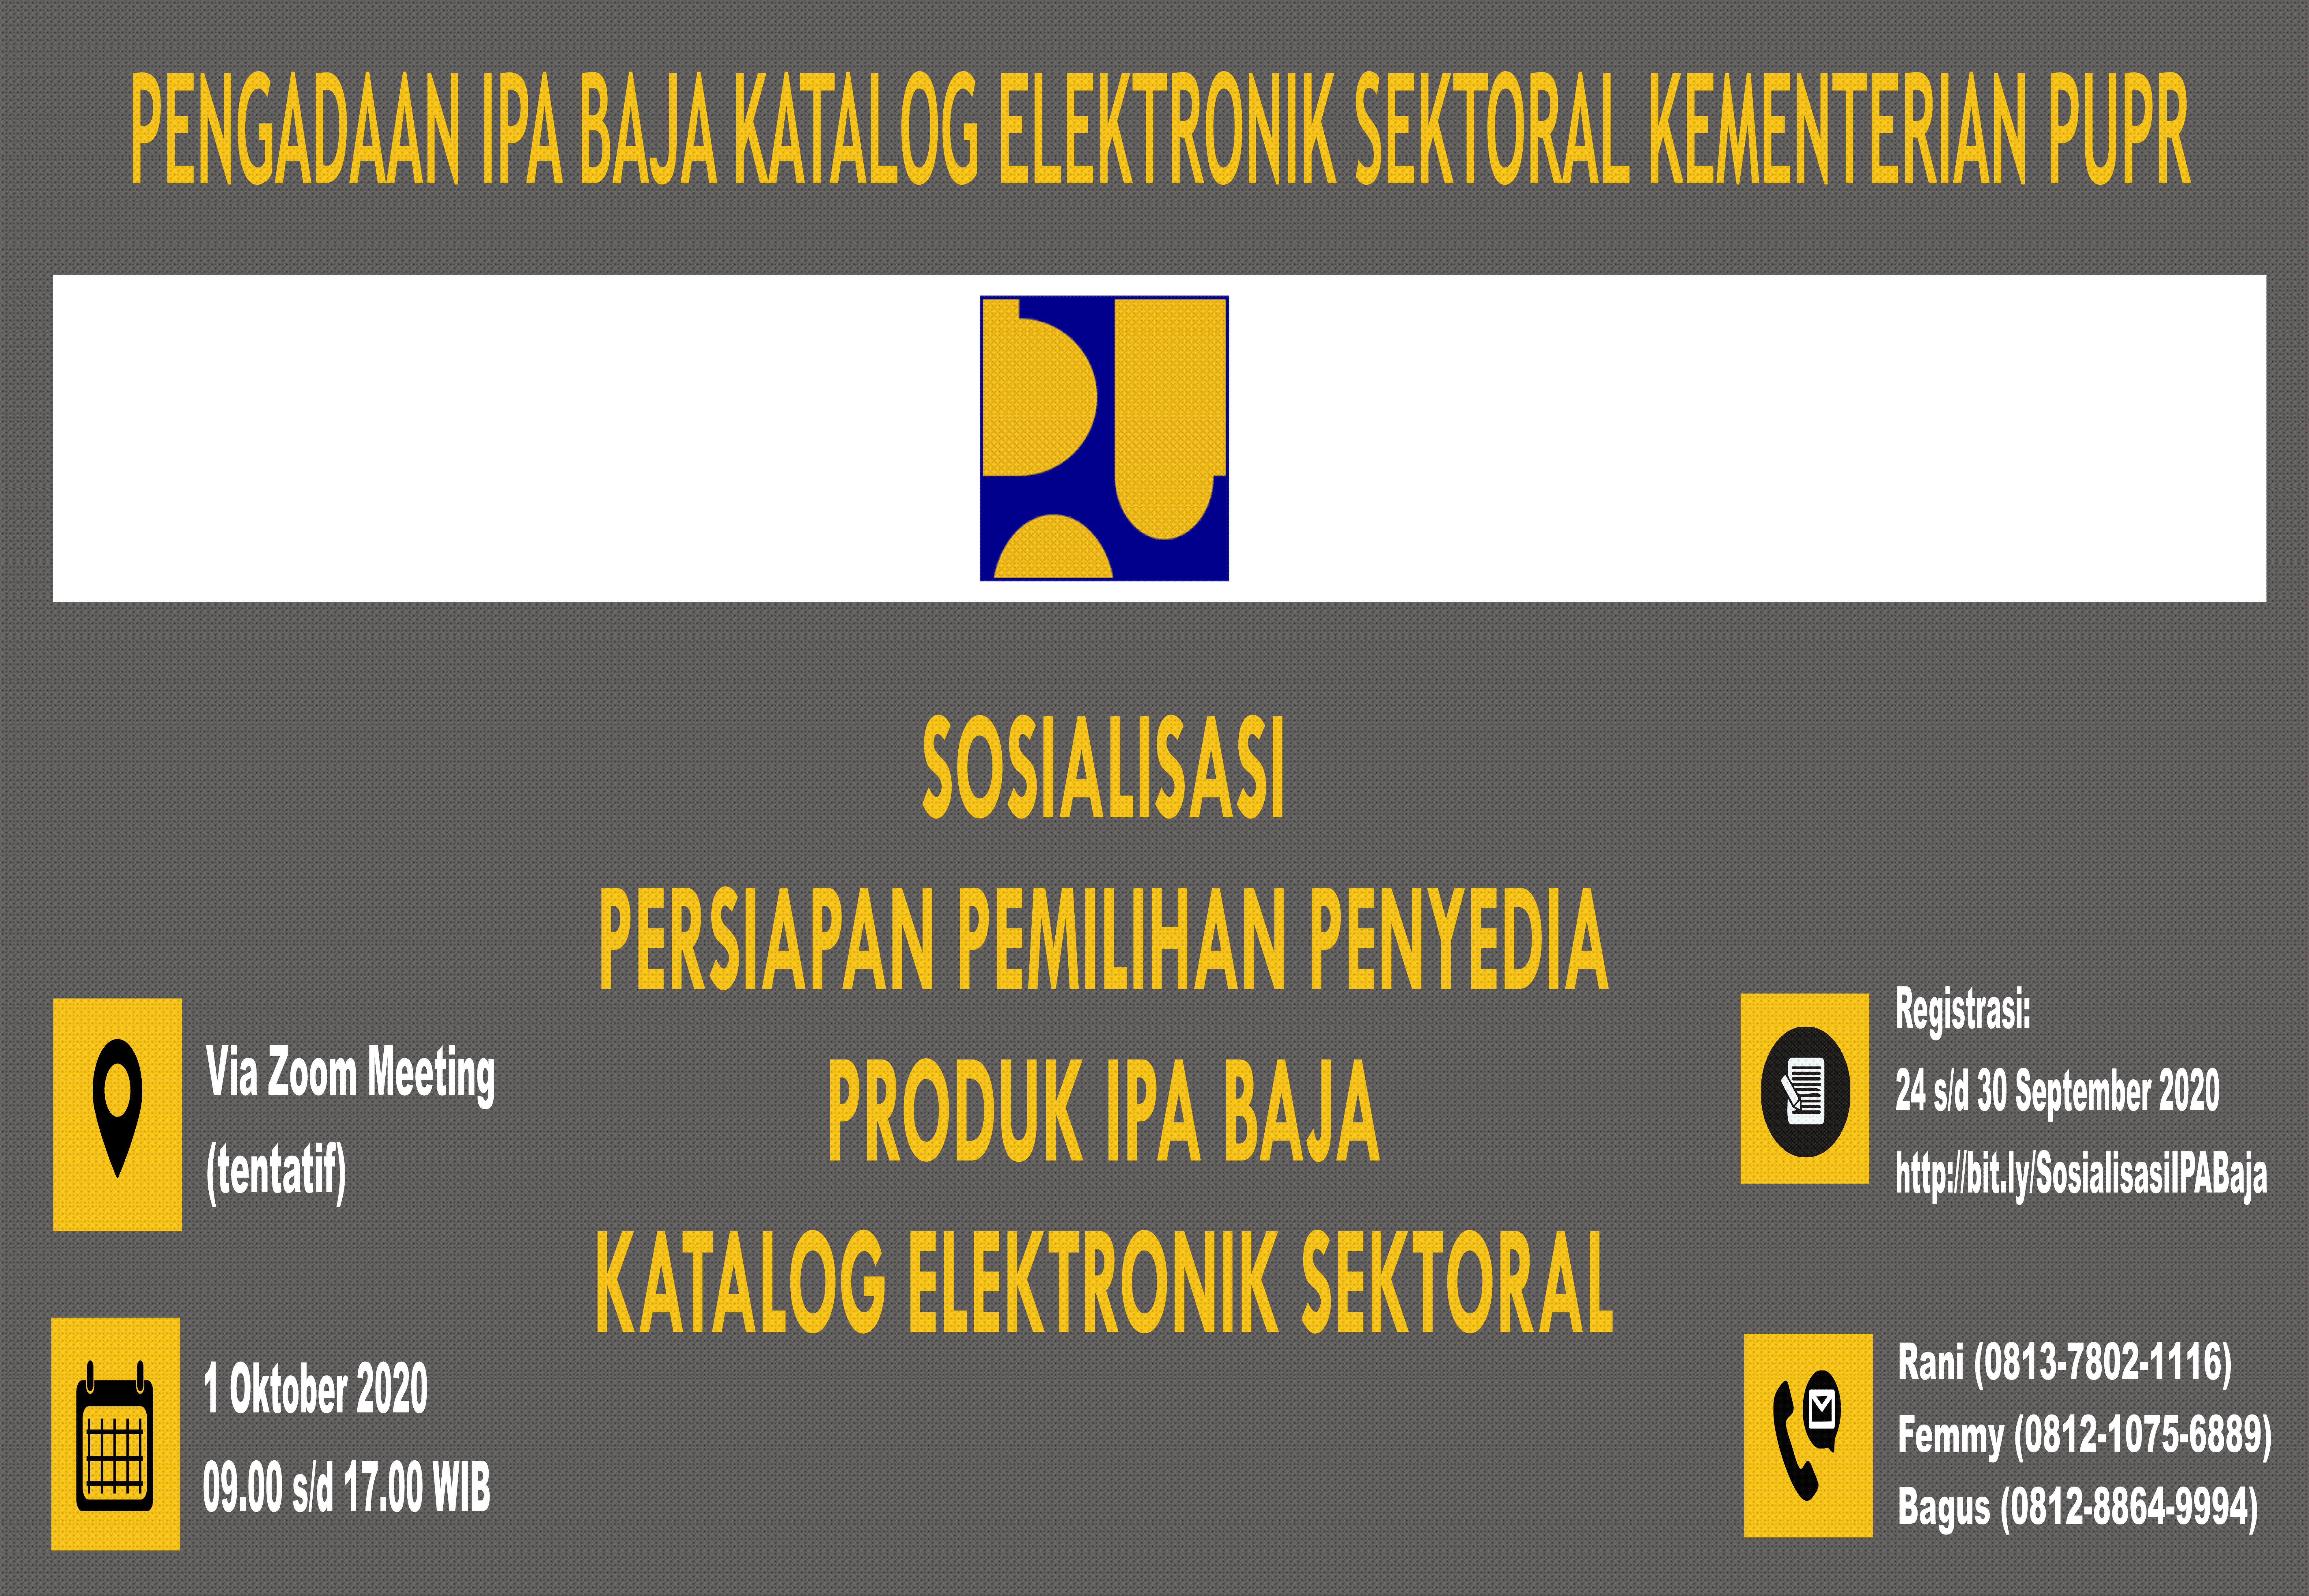 Pendaftaran Peserta Sosialisasi Persiapan Pelaksanaan Katalog Elektronik Sektoral Produk IPA Paket Baja bidang Cipta Karya